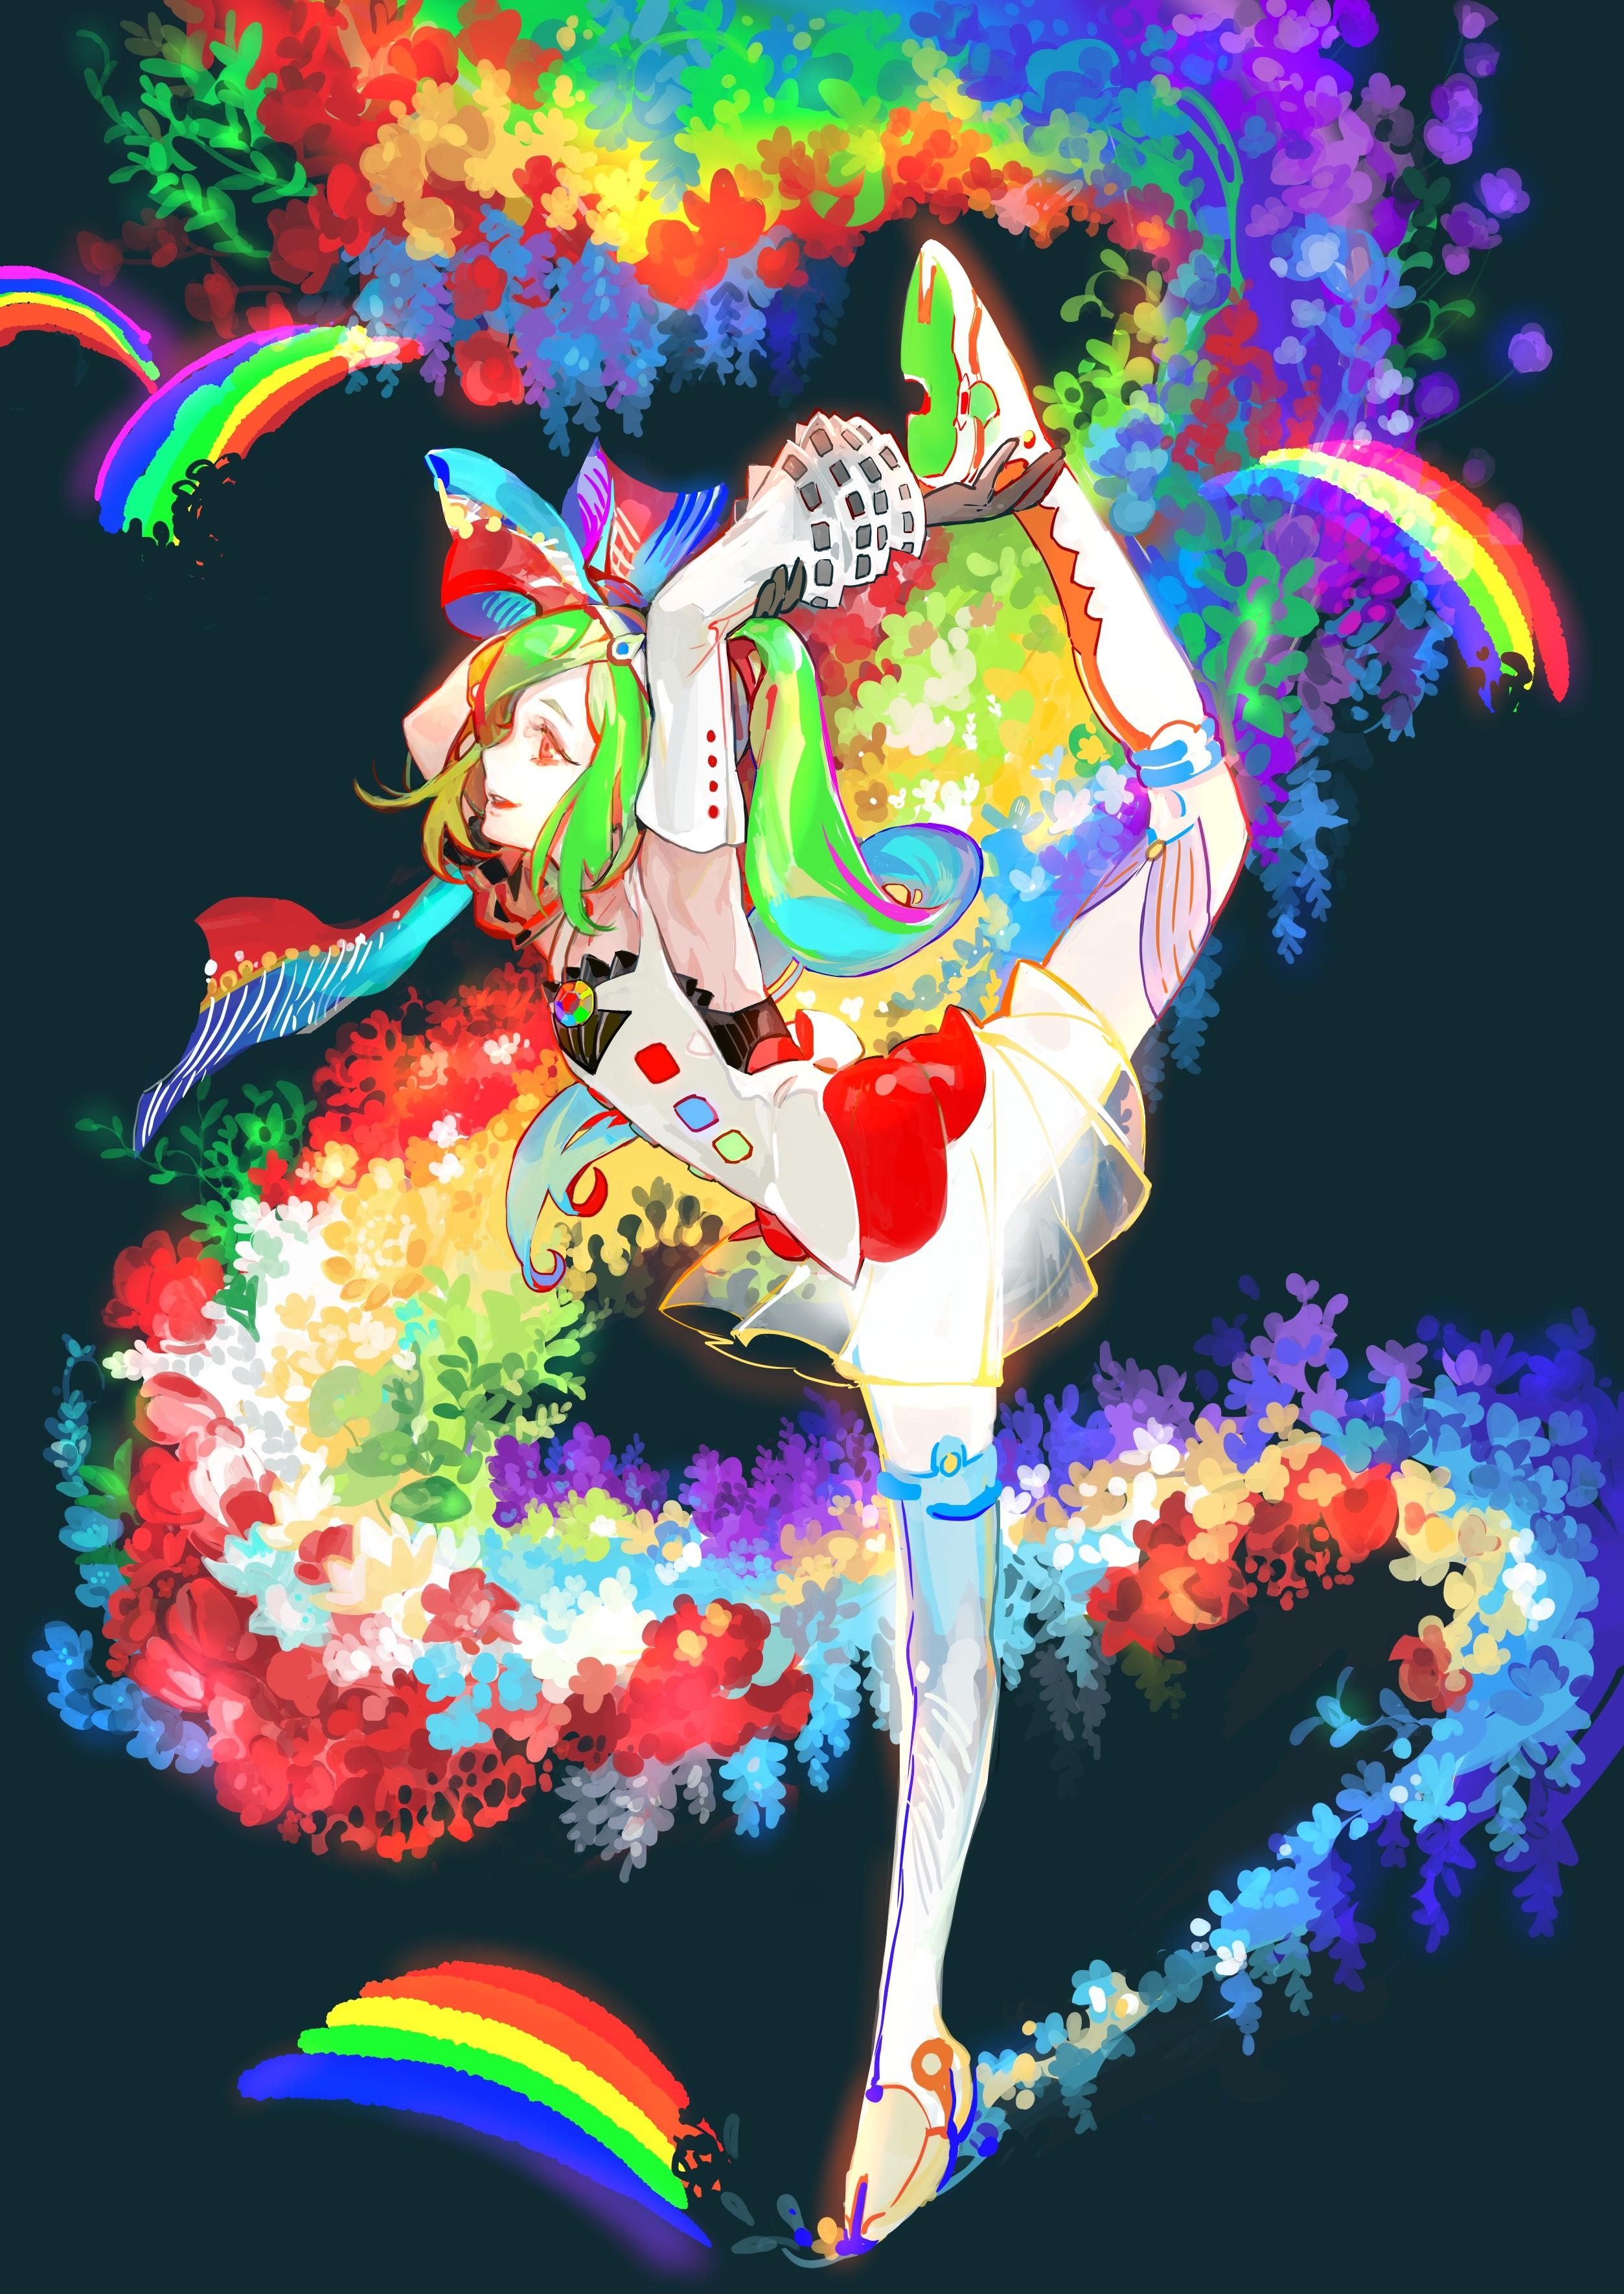 Colorful illustration long hair anime anime girls dress red eyes